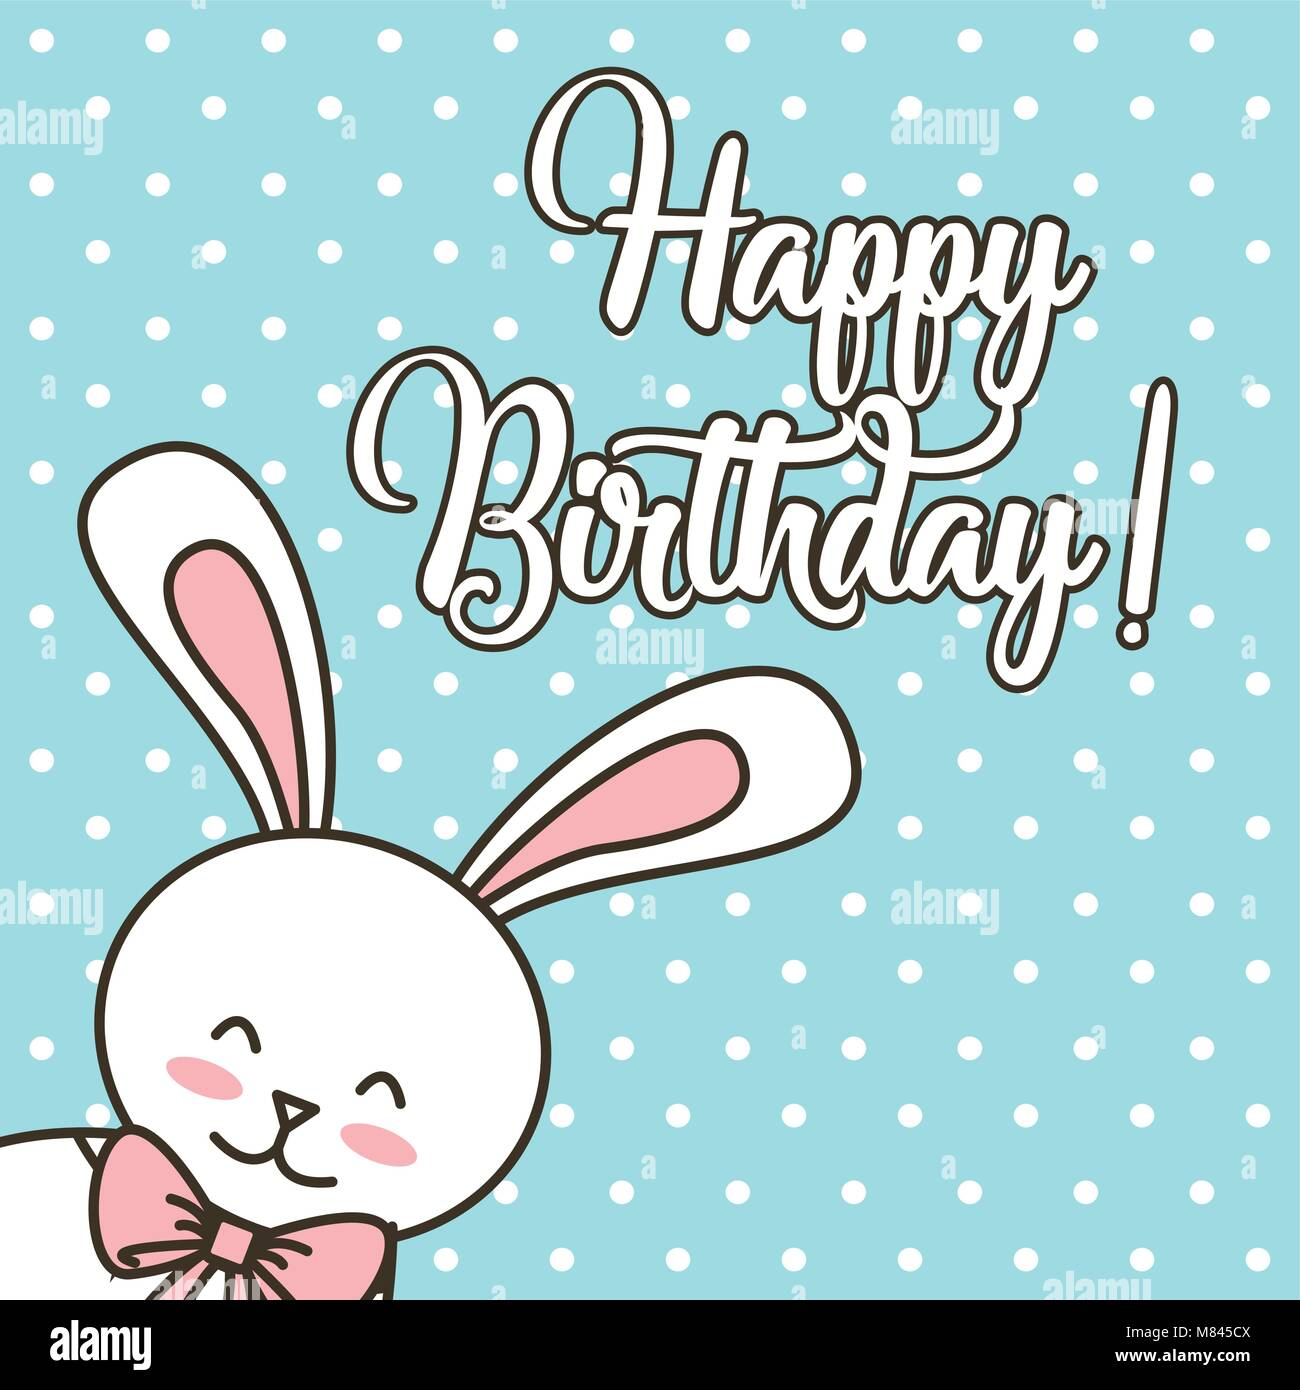 Happy Birthday Card Cartoon Cute Bunny Avec Bow Vector Illustration